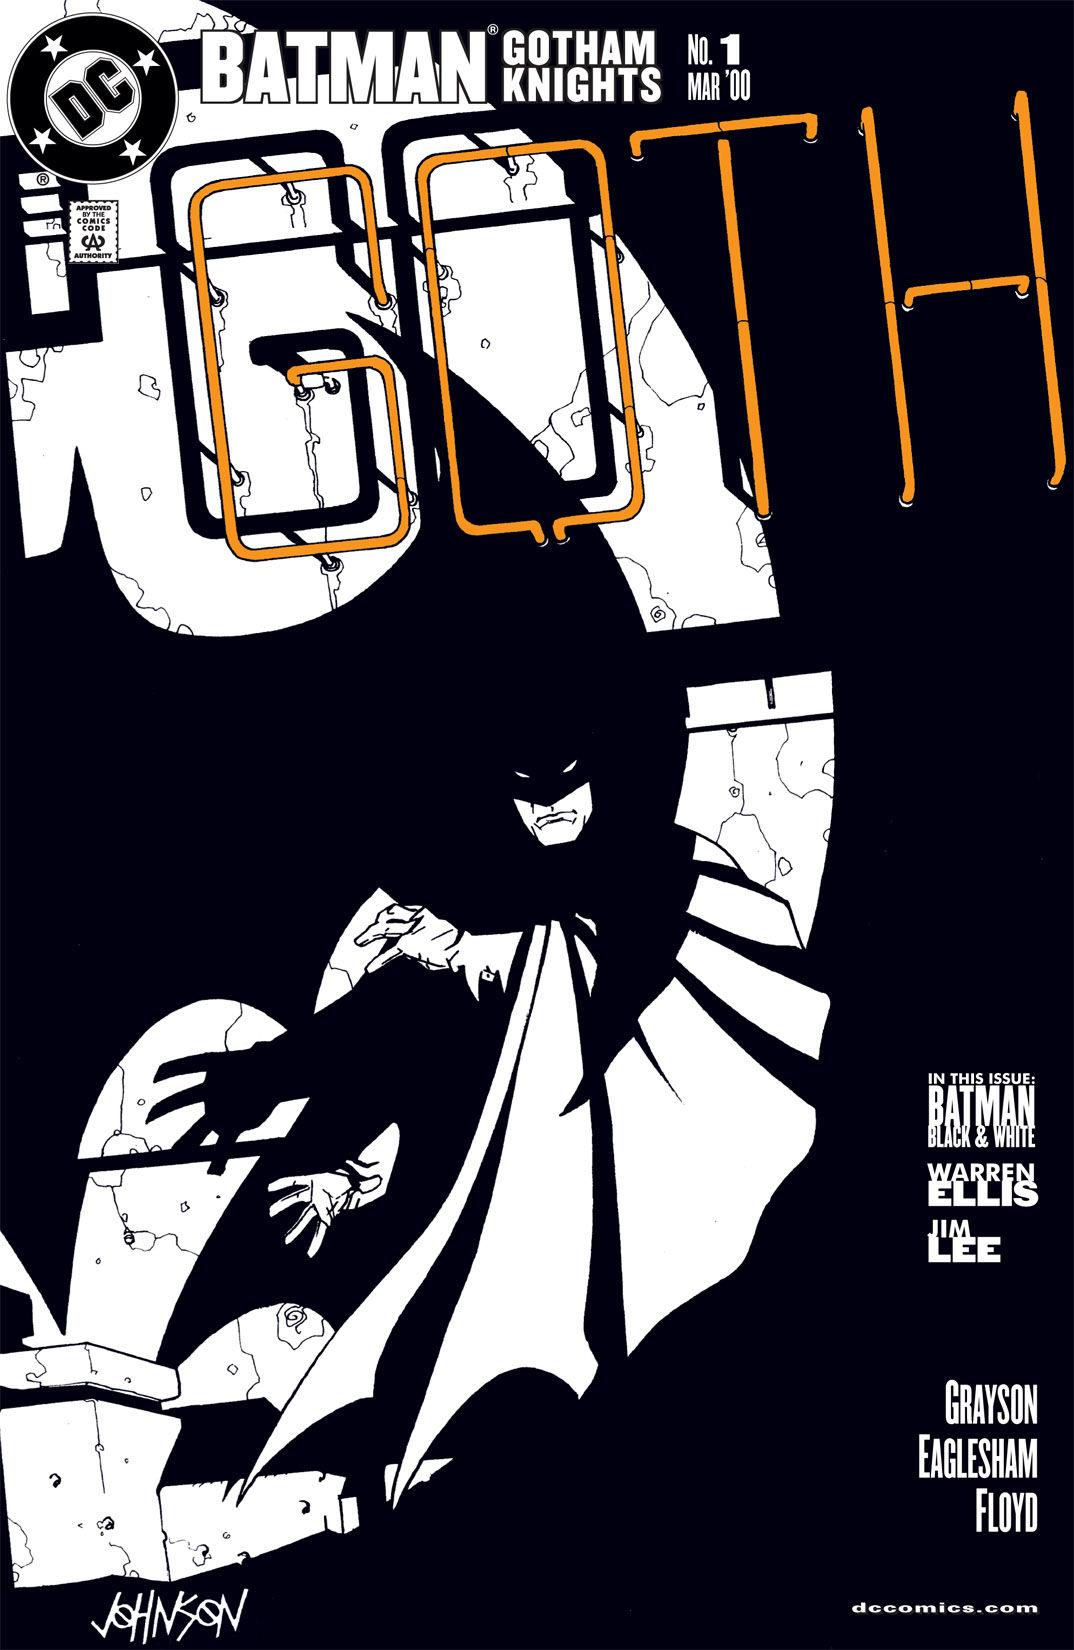 Free DC Comics for Kindle ( Batman / Superman / Wonder Woman / Harley Quinn )